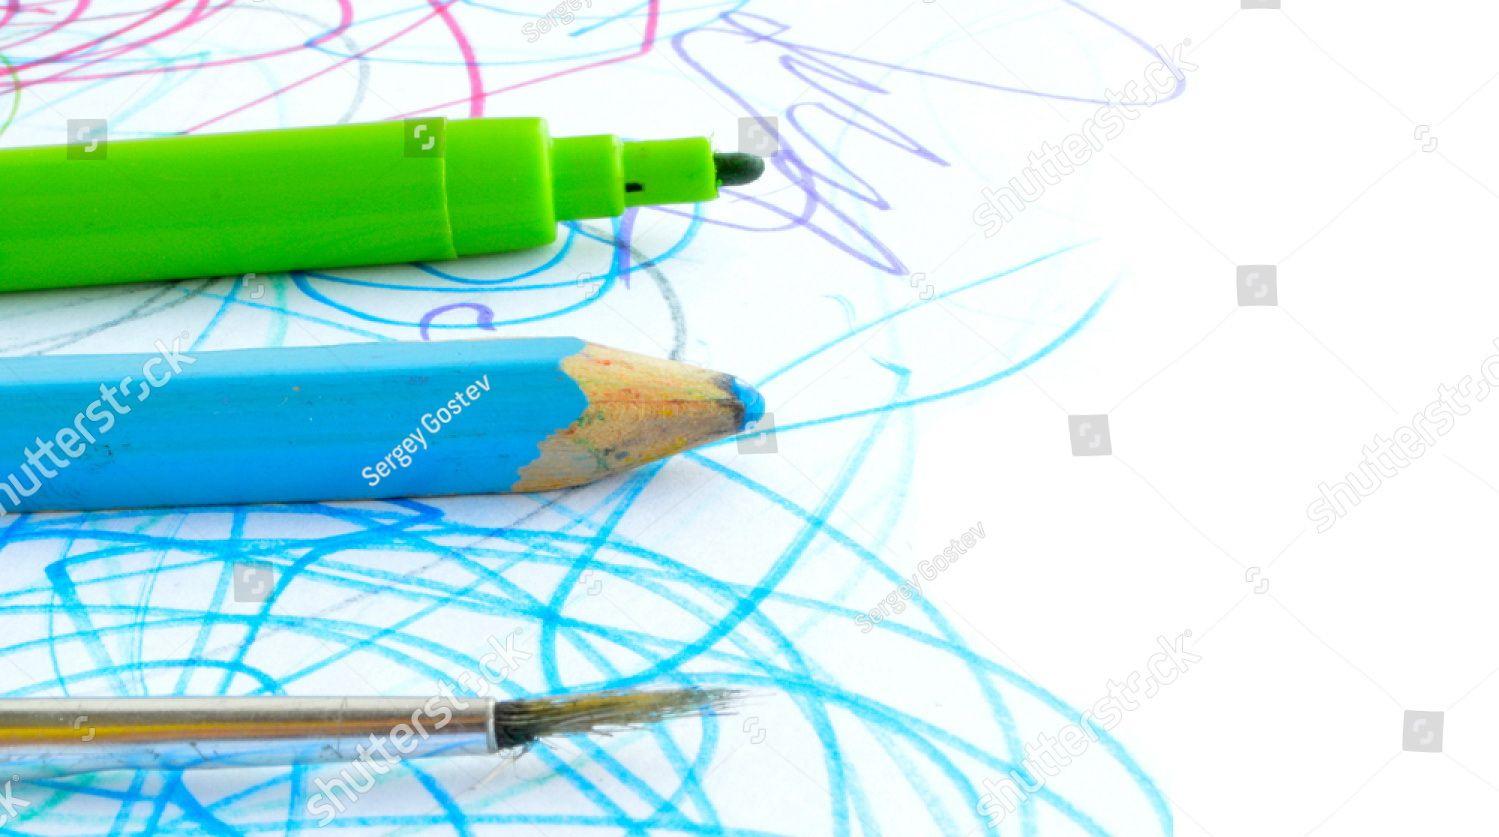 stock-photo-felt-tip-pen-pencil-and-brush-601634552.jpg